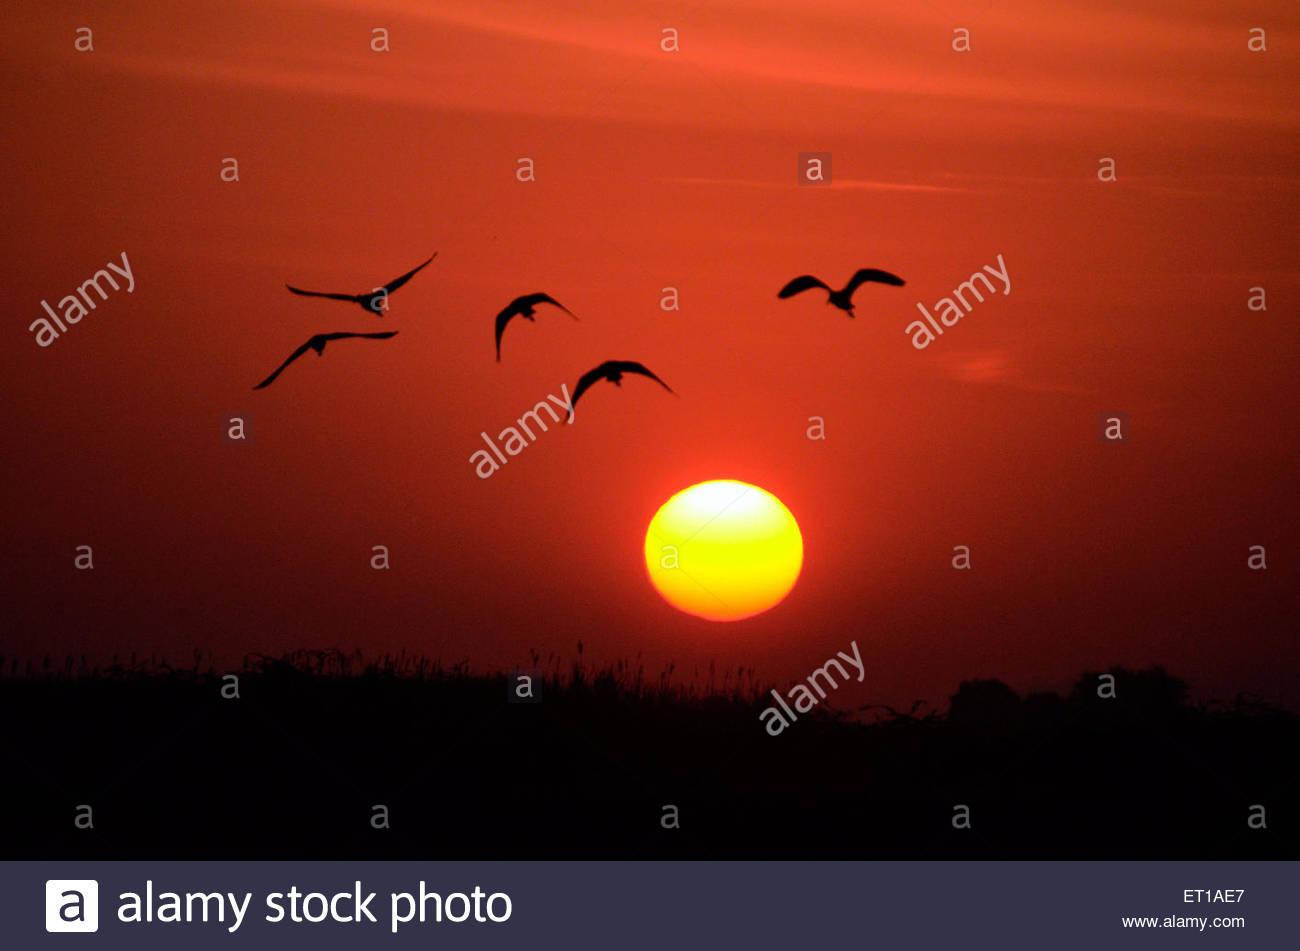 Fliegende Zugvögel während Sonnenuntergang Pune Maharashtra Indien Asien Stockbild